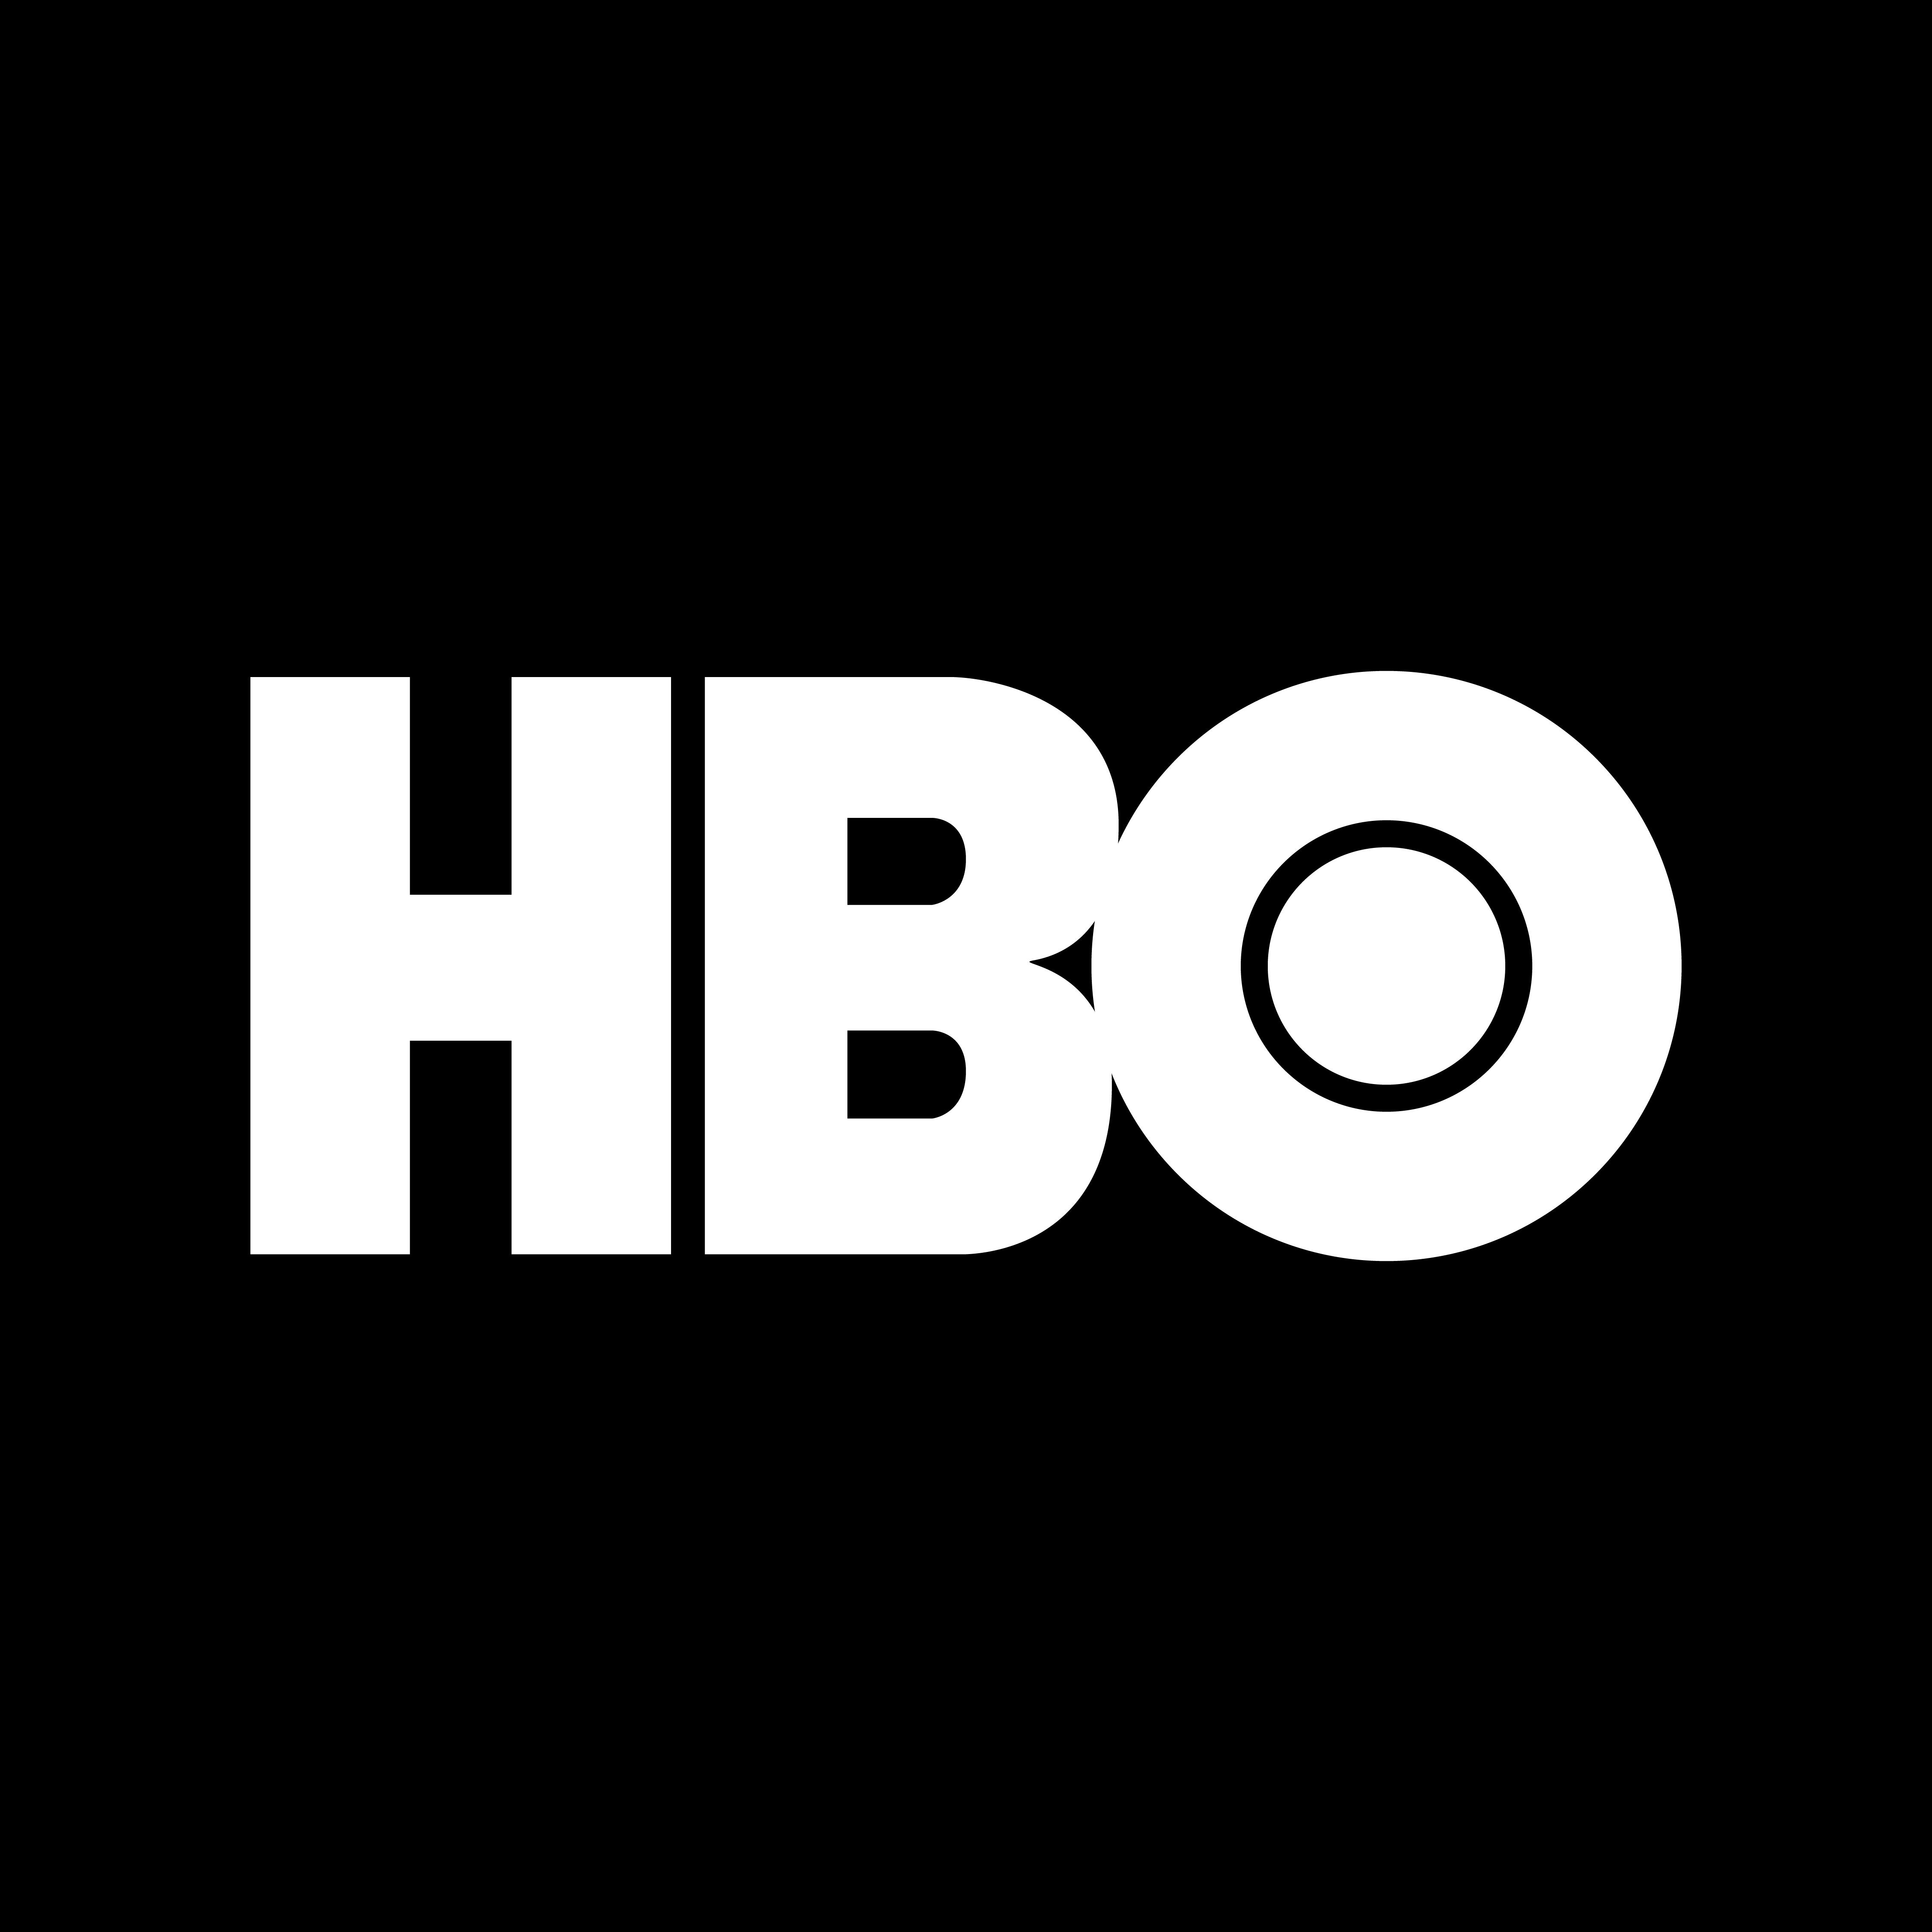 Beau HBO (Home Box Office) U2014 Designer: Gerard Huerta; Firm: Gerard Huerta